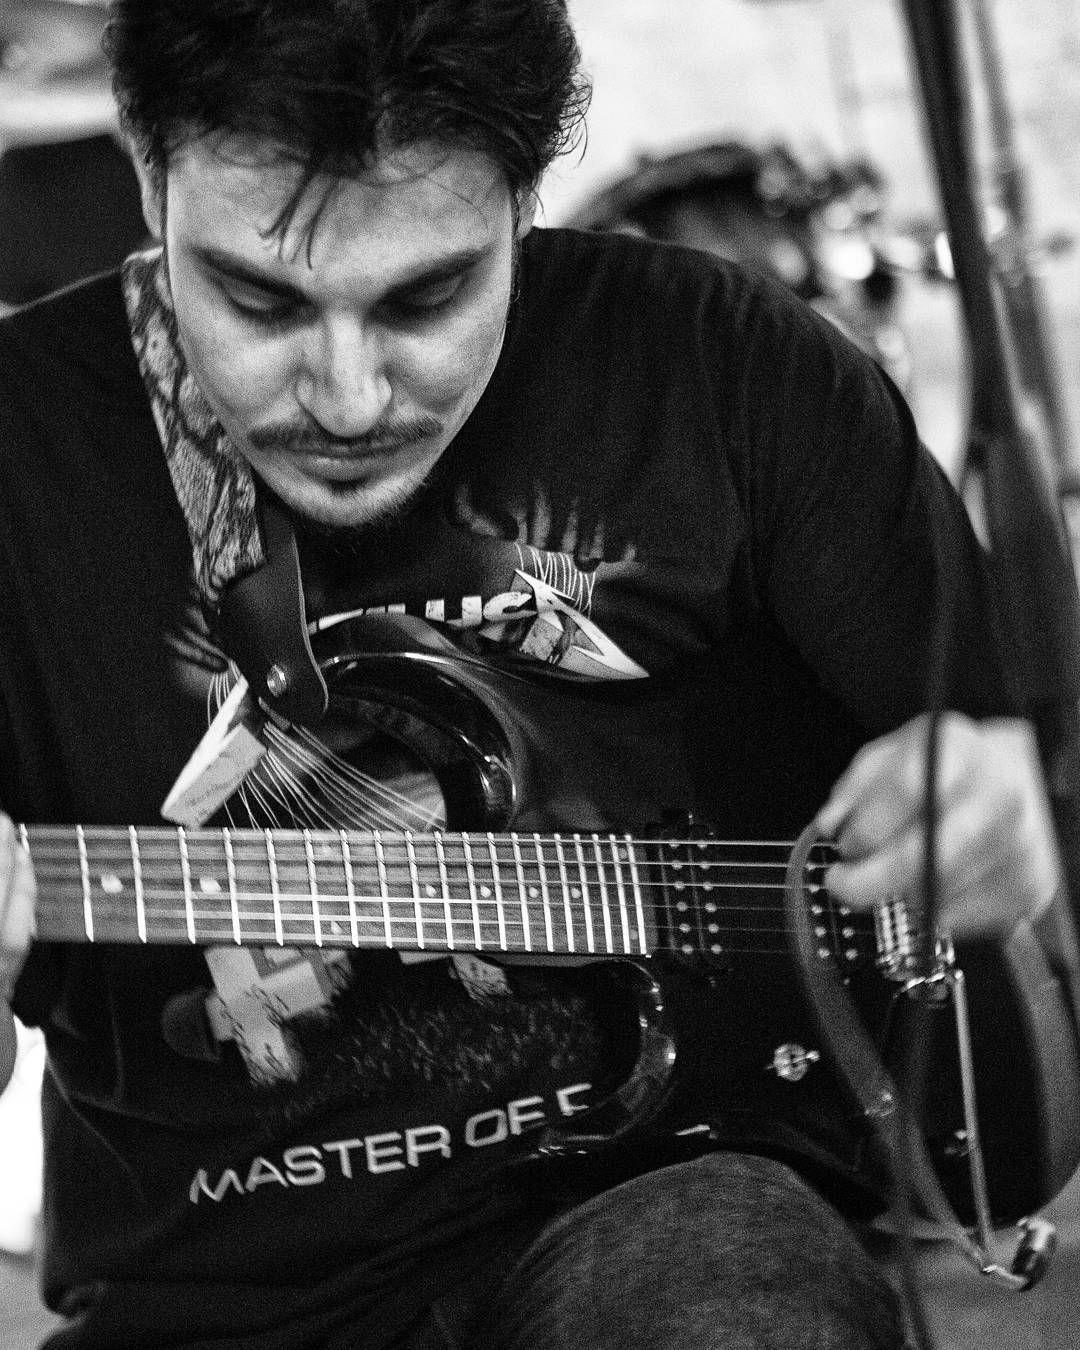 #venom69 #rock #band #concert #finaleemilia #bw